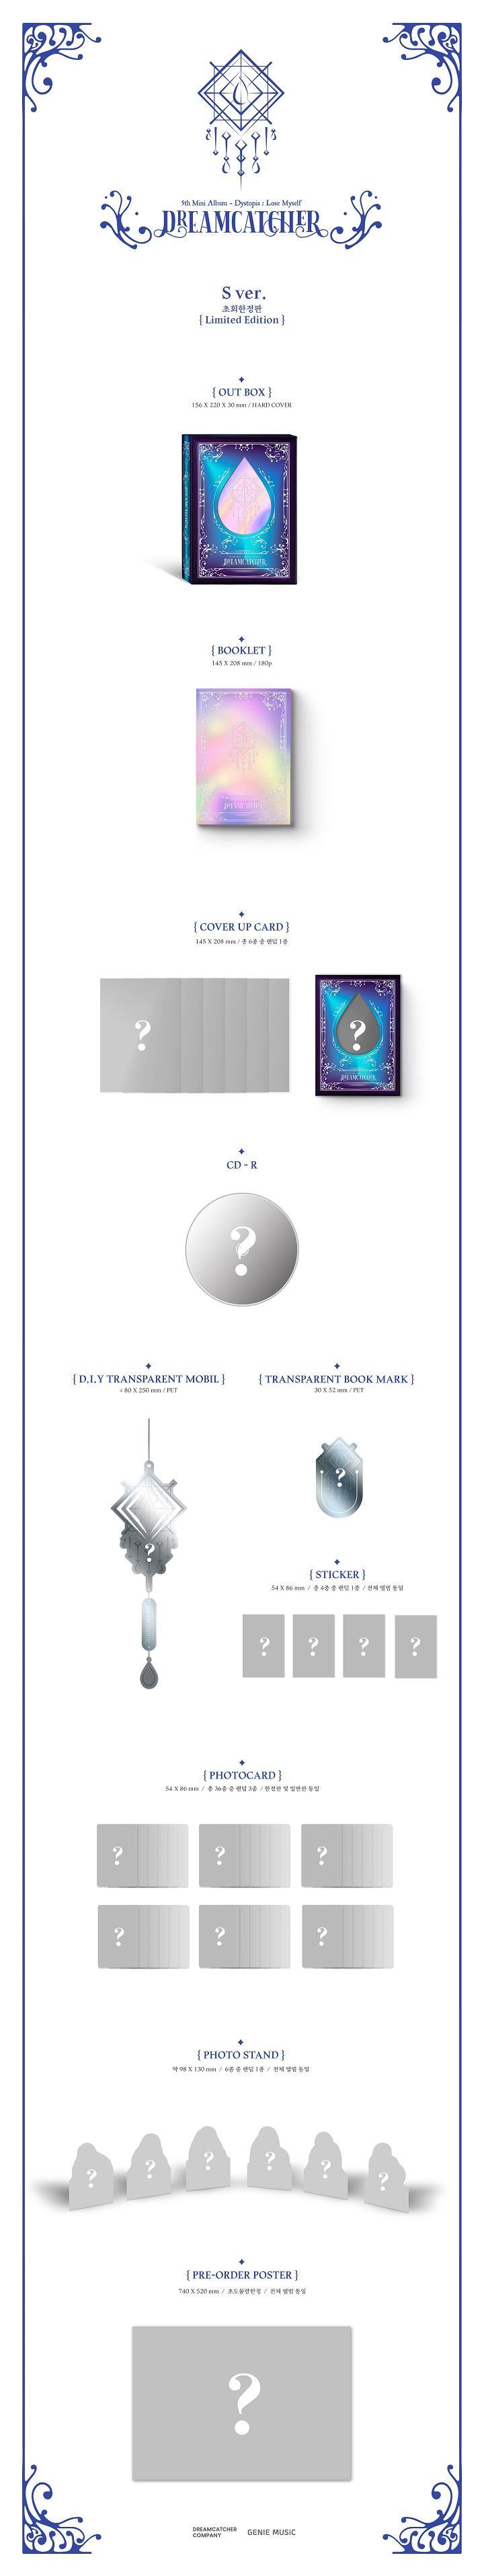 DREAMCATCHER - 5th Mini [Dystopia : Lose Myself] (S.ver Limited Edition) + Poster